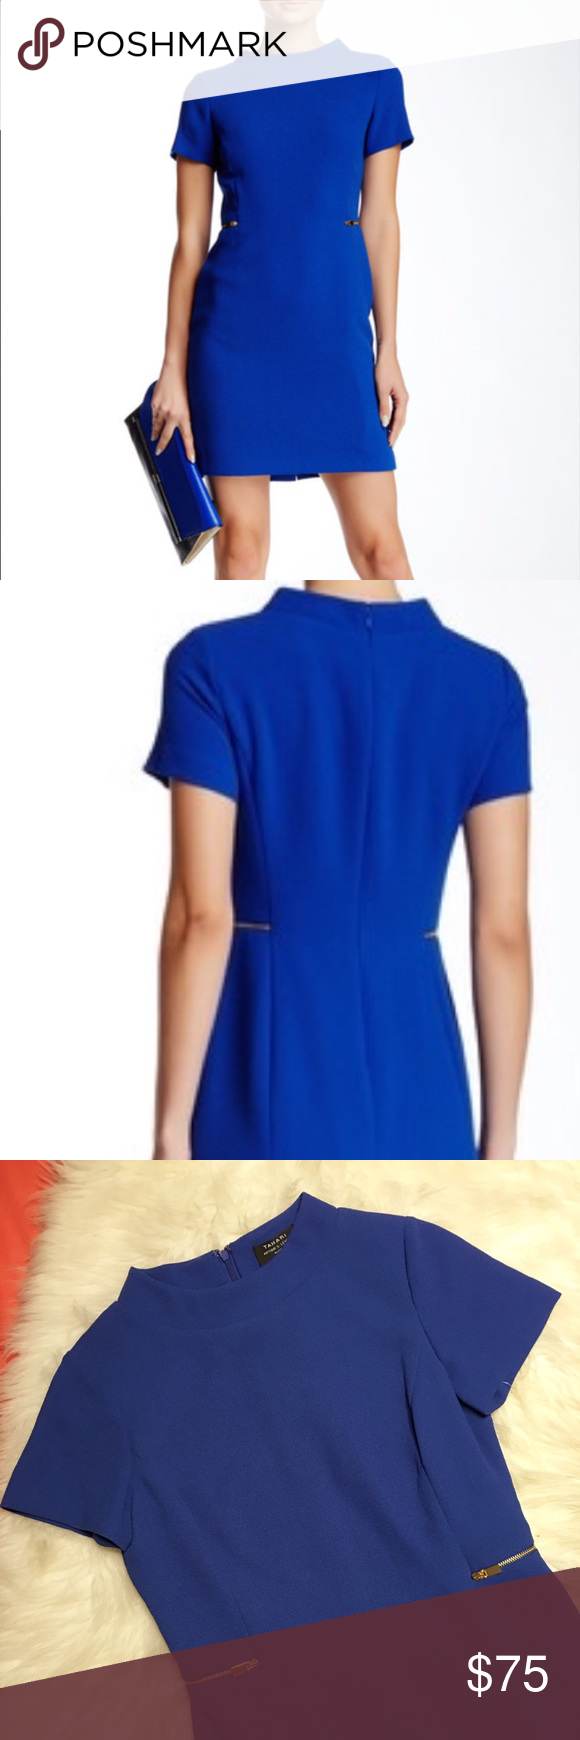 NWT Tahari Size 4 Petite Cobalt Dress Brand new with tags attached Tahari Cobalt Dress in Size 4 Petite. Gorgeous gold zipper design on each side of dress. Full zipper on back of dress for premium fitting. Dress is fully lined. Tahari Dresses #cobaltdress